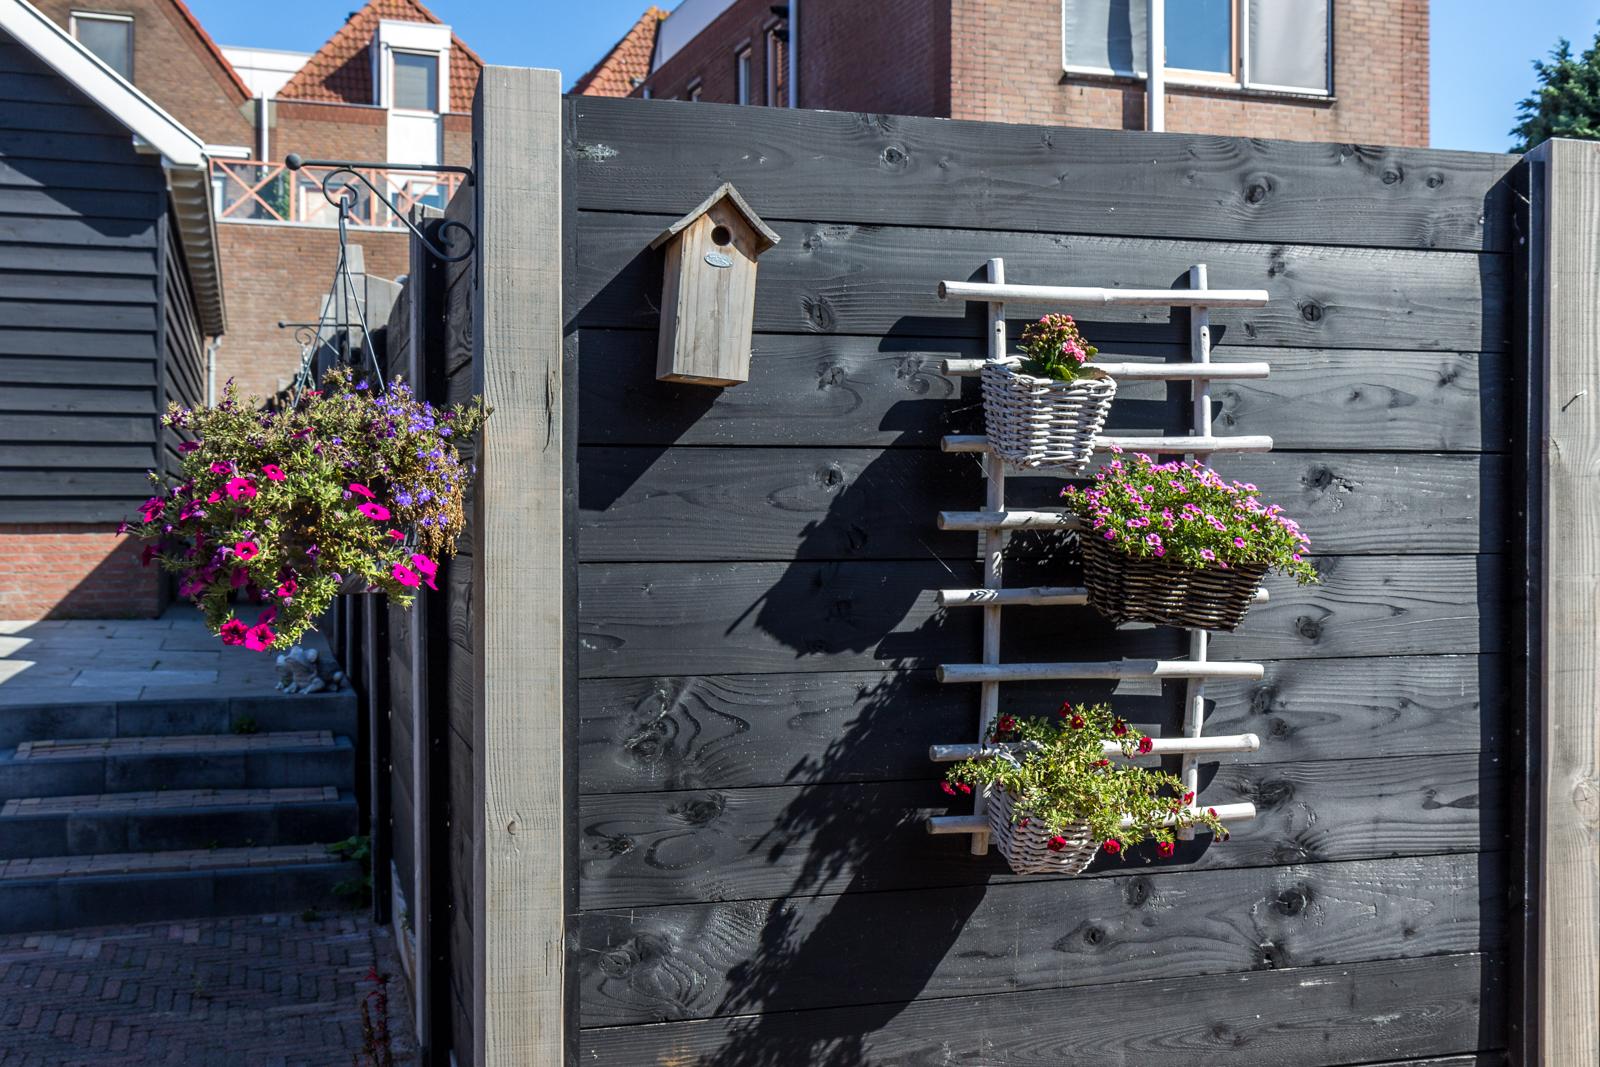 Omheining-tuin-Den-Oever-5287